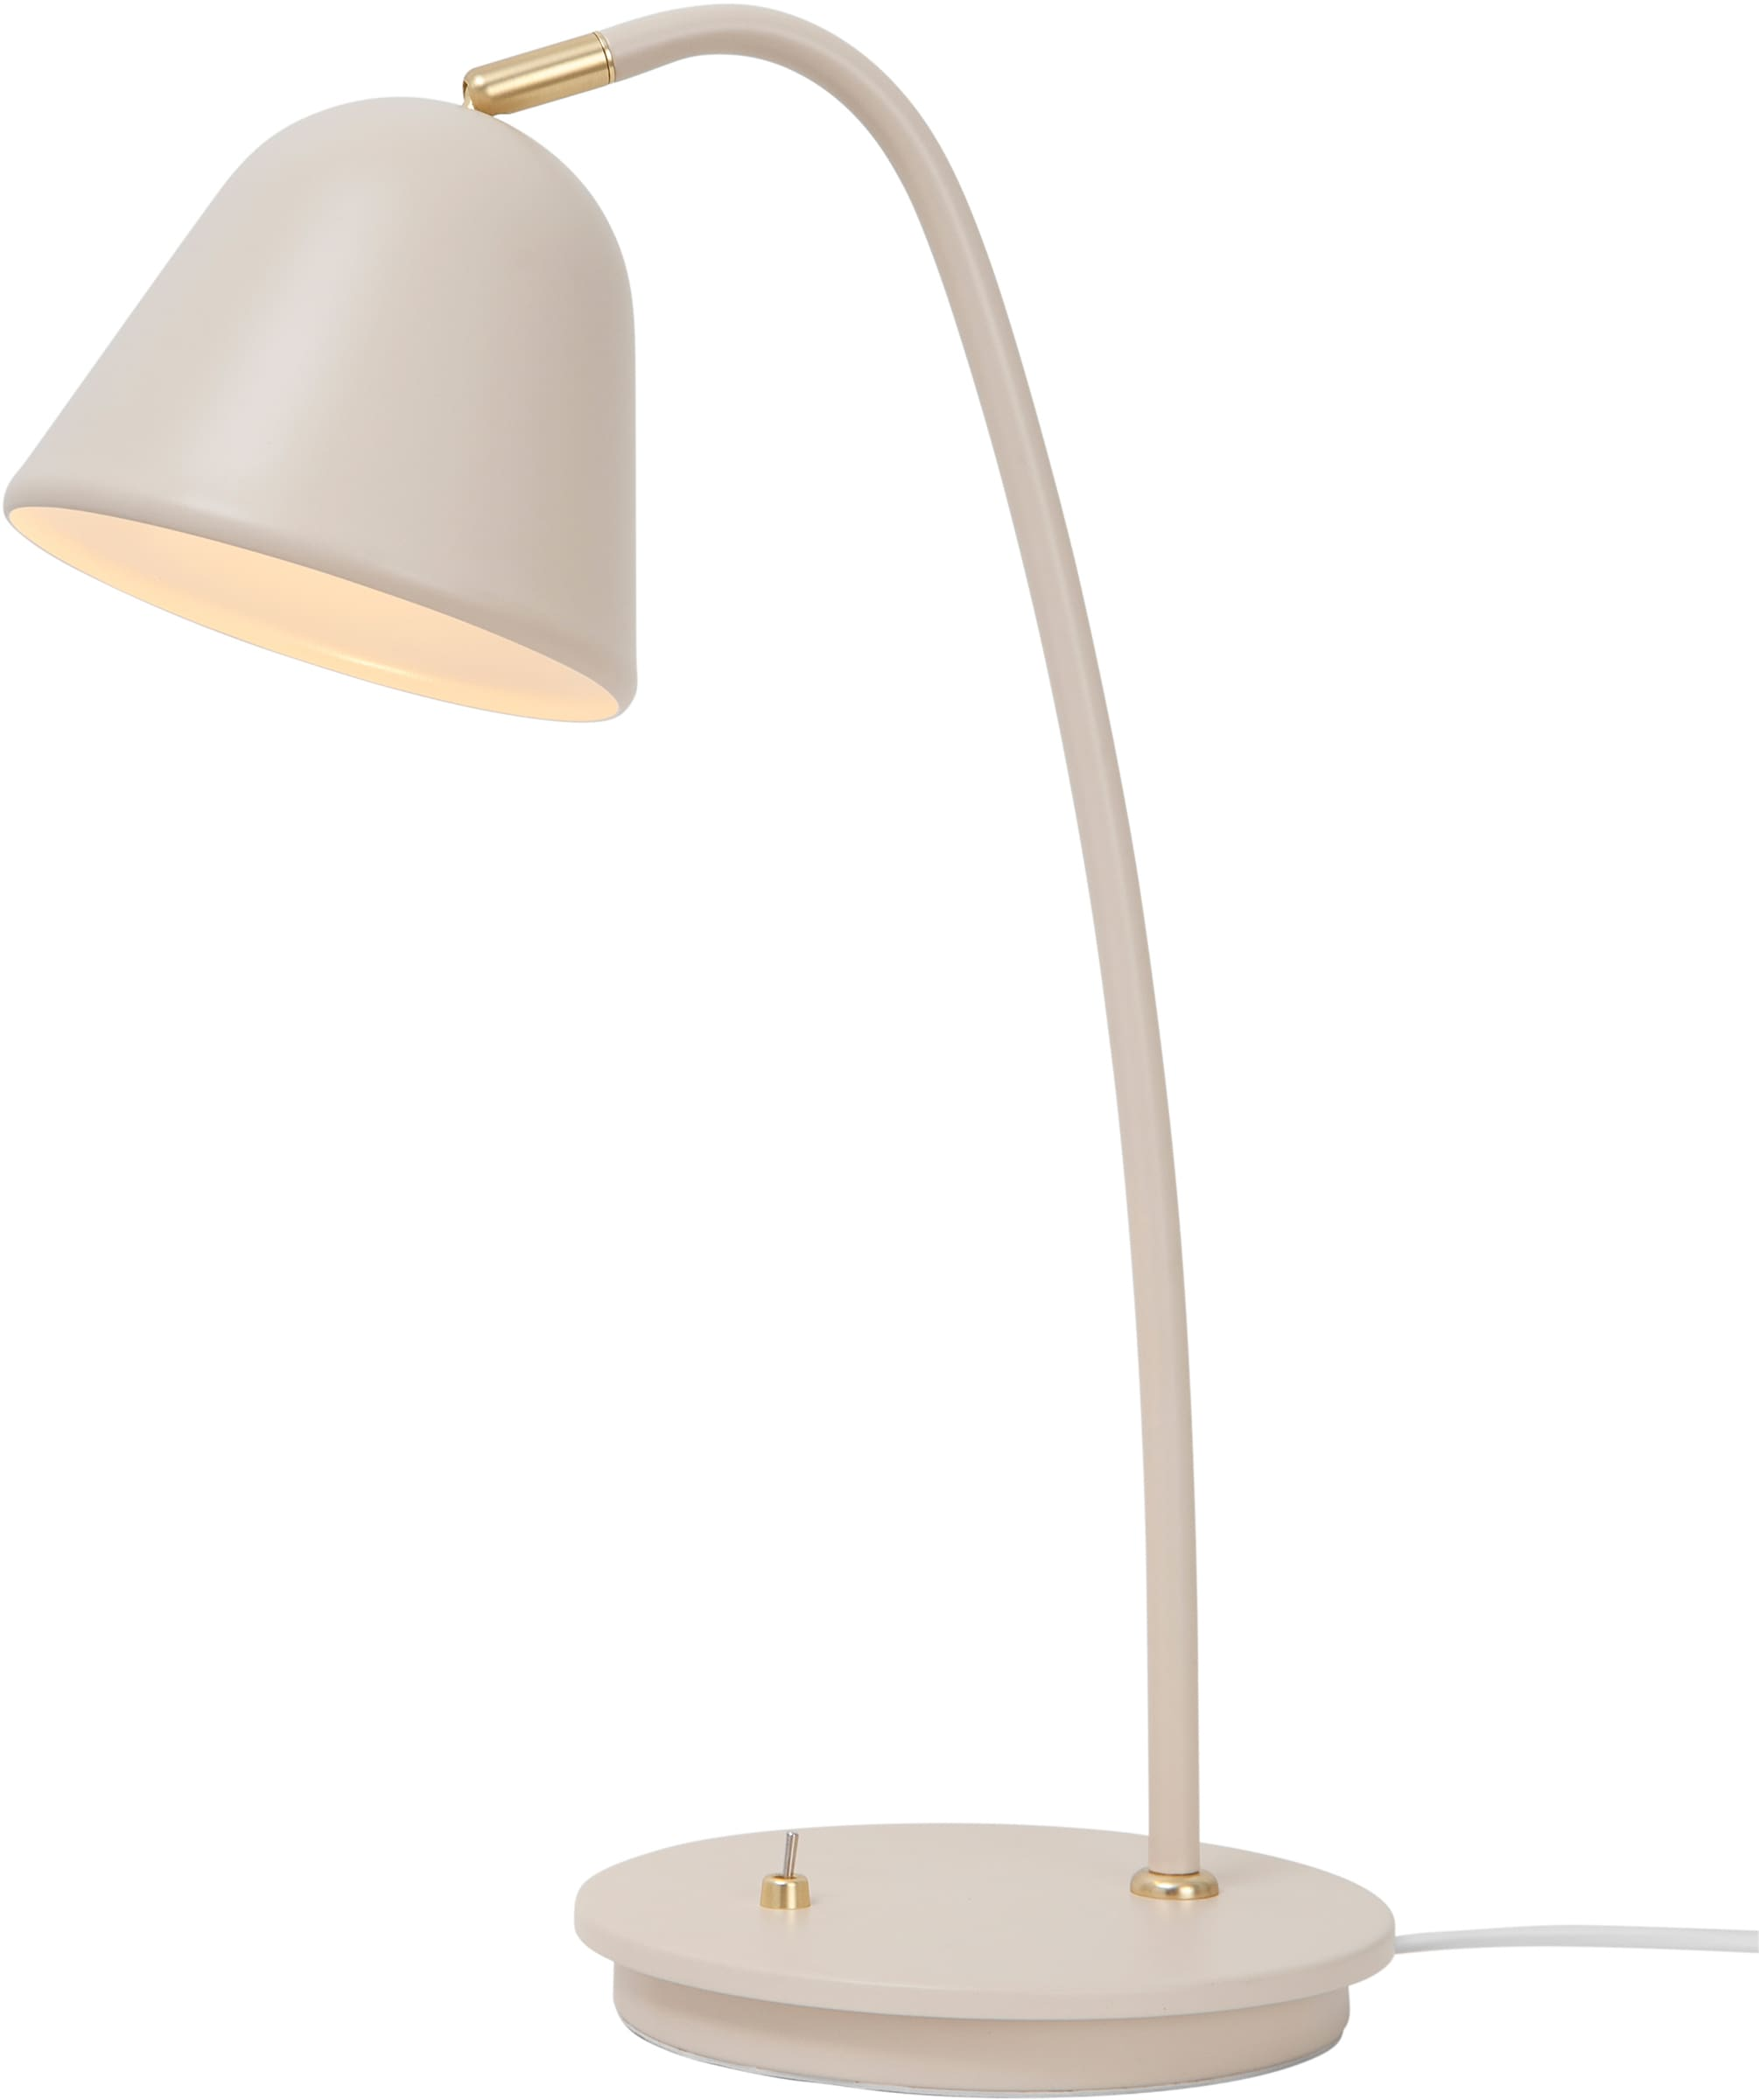 Nordlux Tischleuchte FLEUR, E14